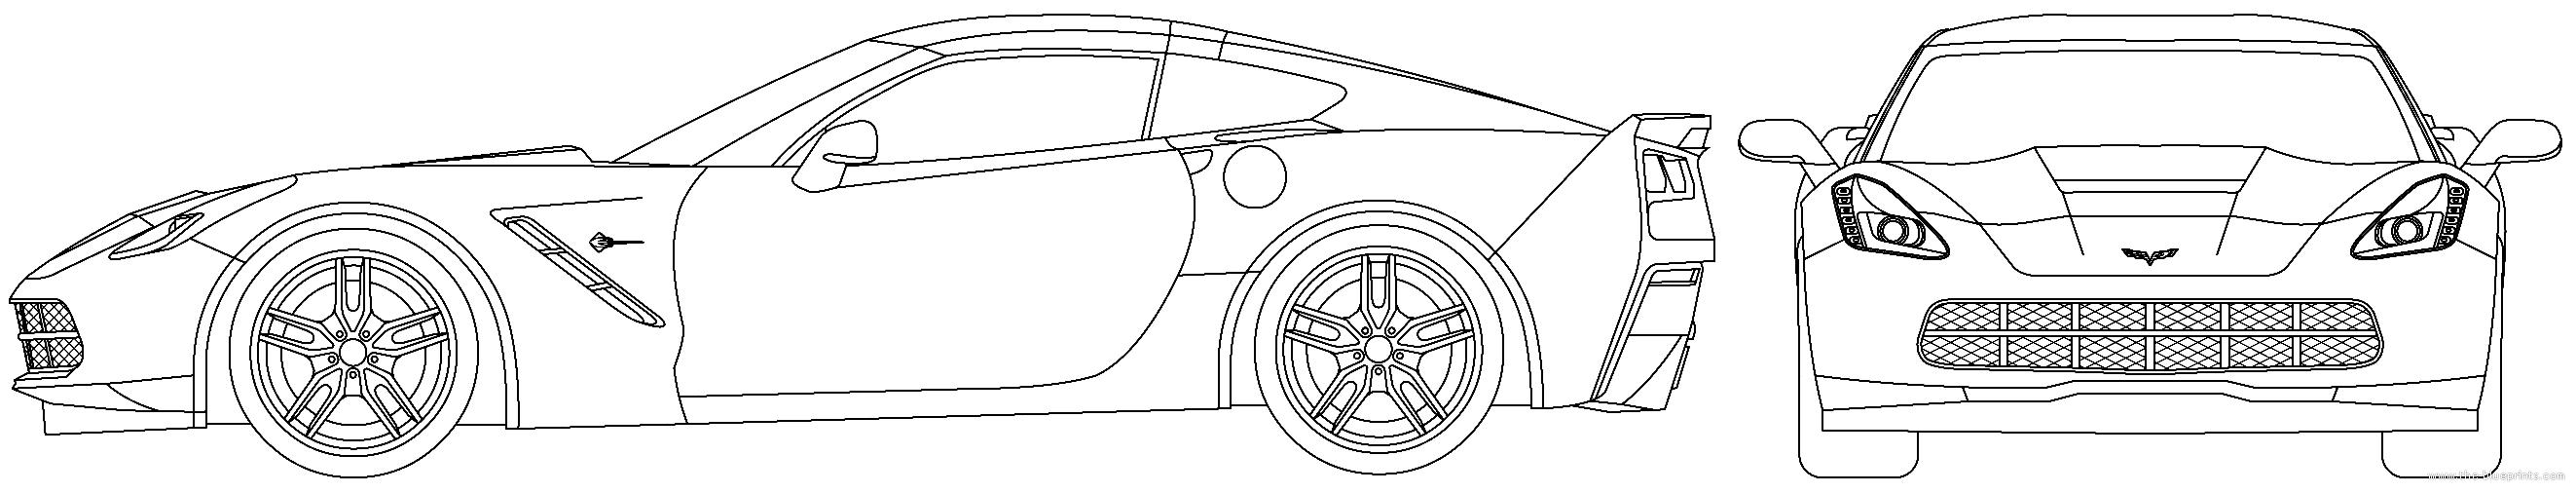 The blueprints blueprints cars chevrolet chevrolet chevrolet corvette c7 stingray 2016 malvernweather Images